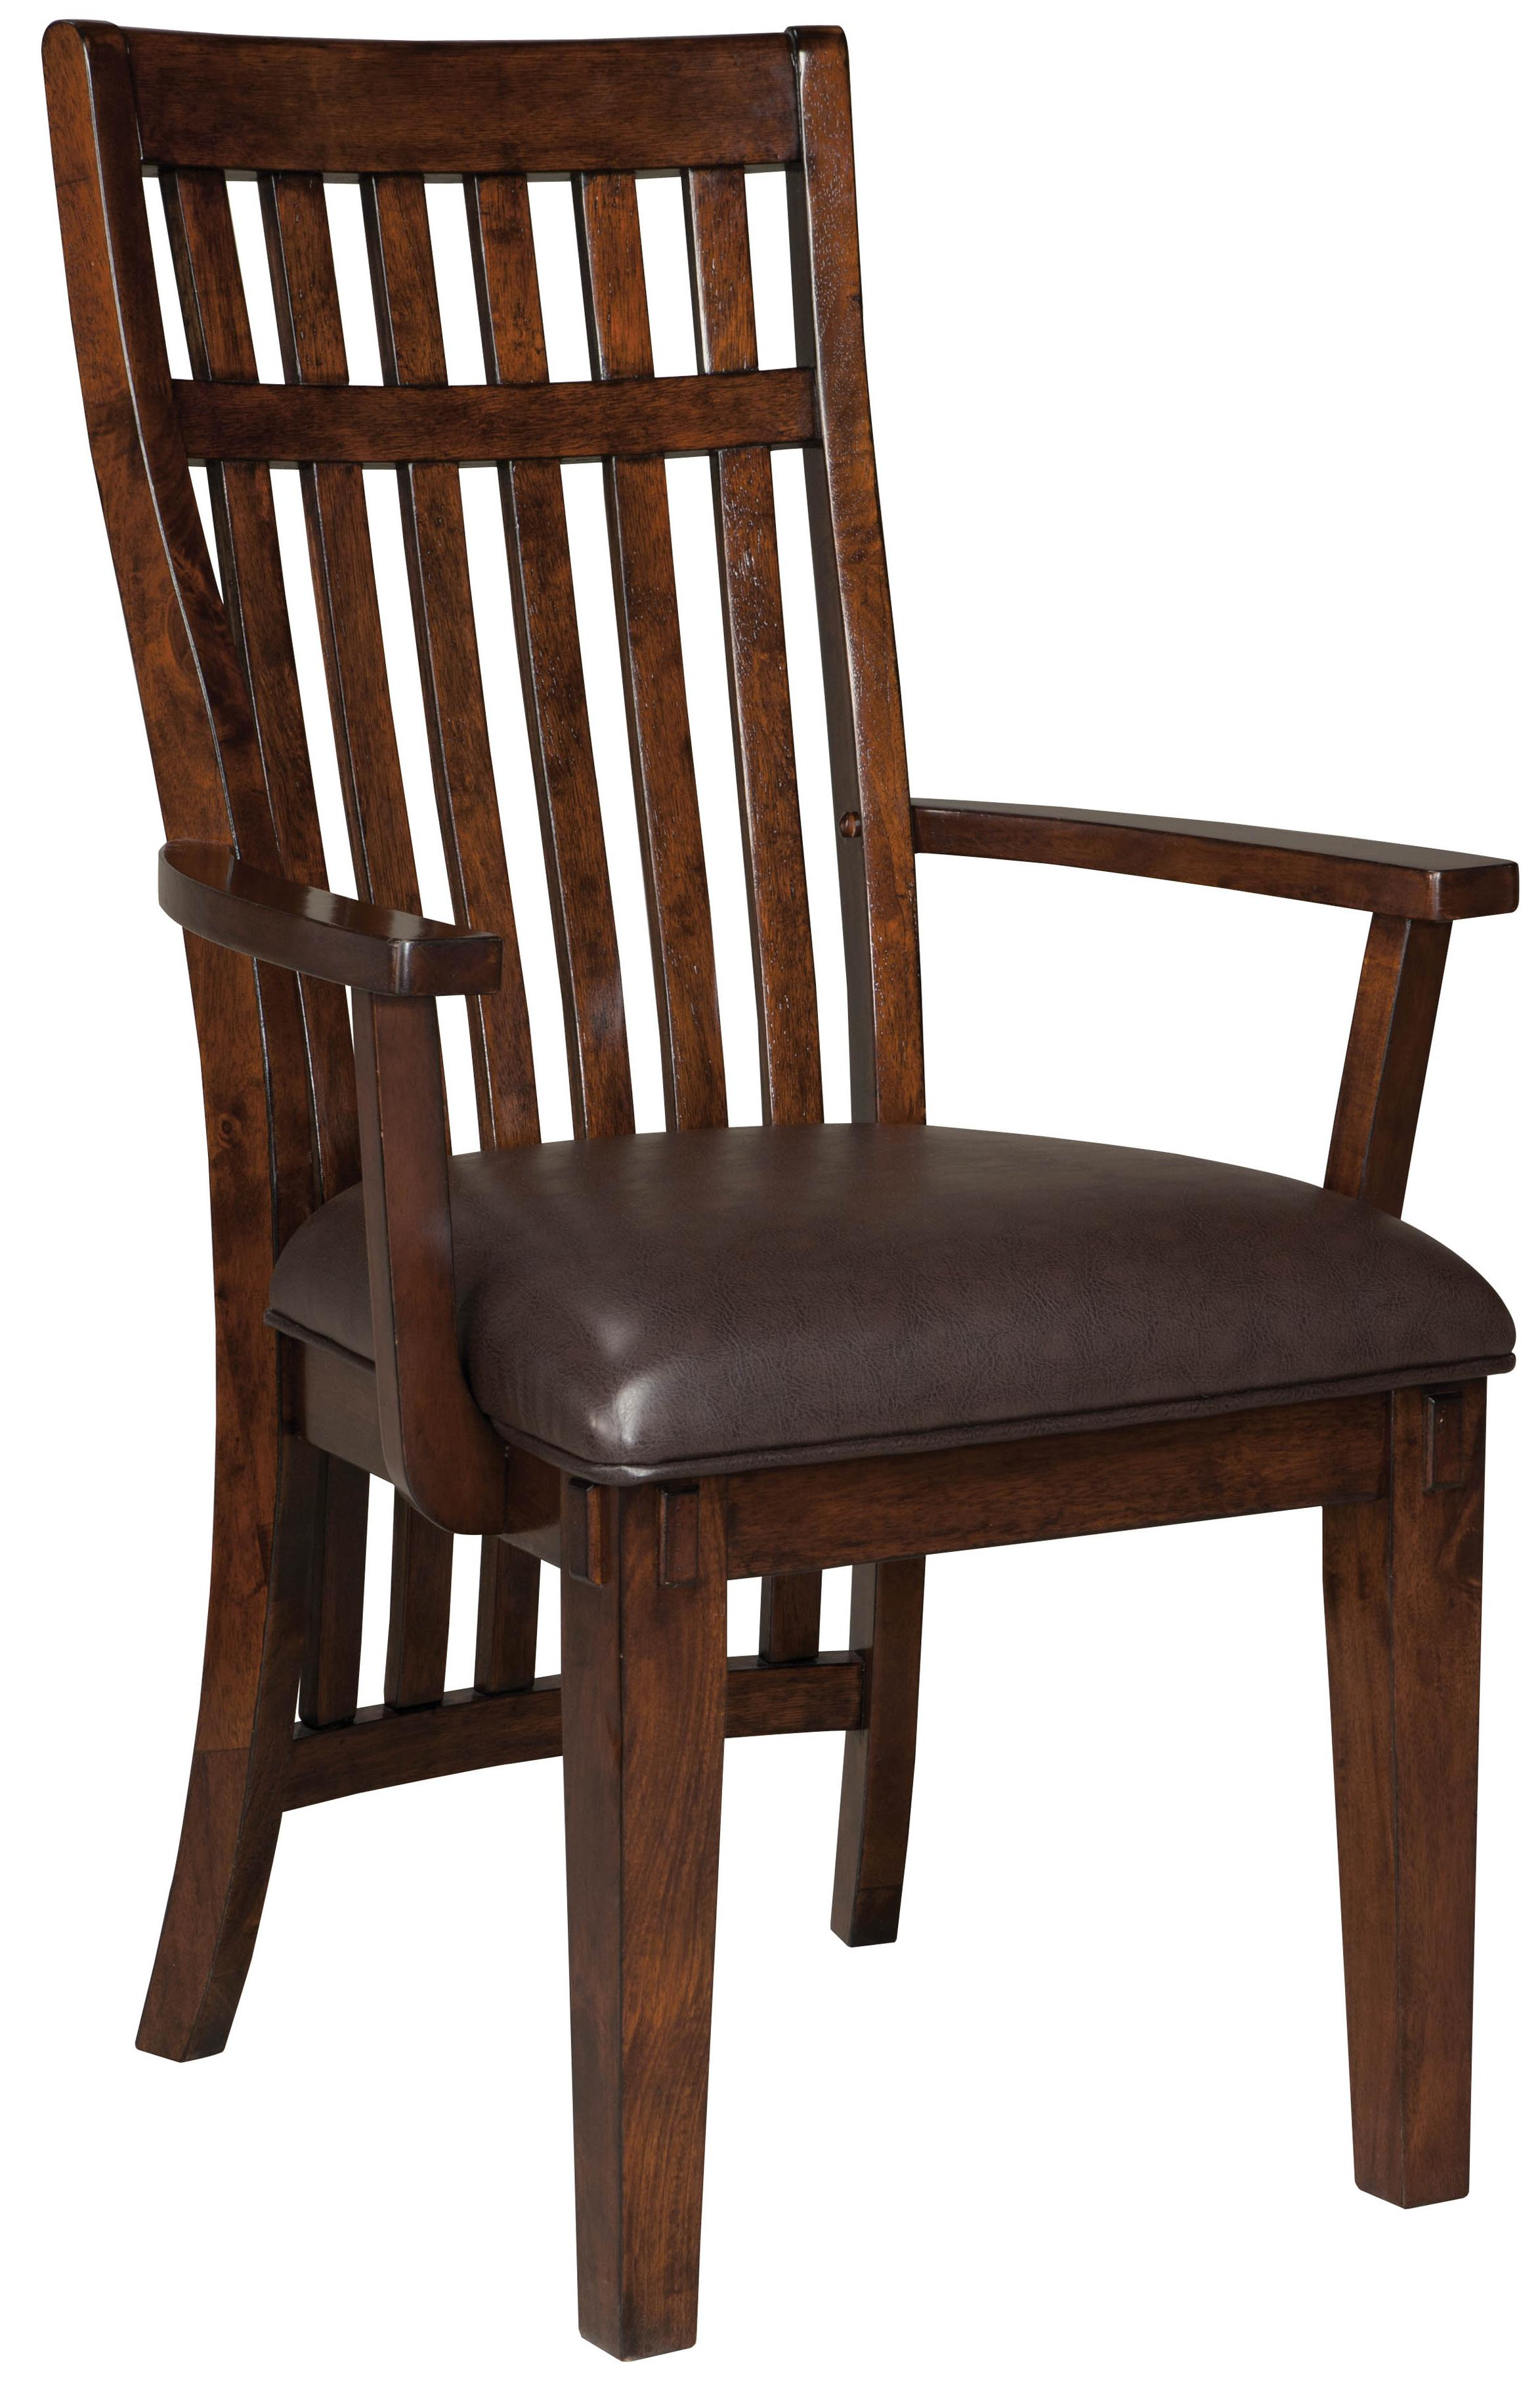 Standard Furniture Artisan Loft Arm Chair - Item Number: 13625